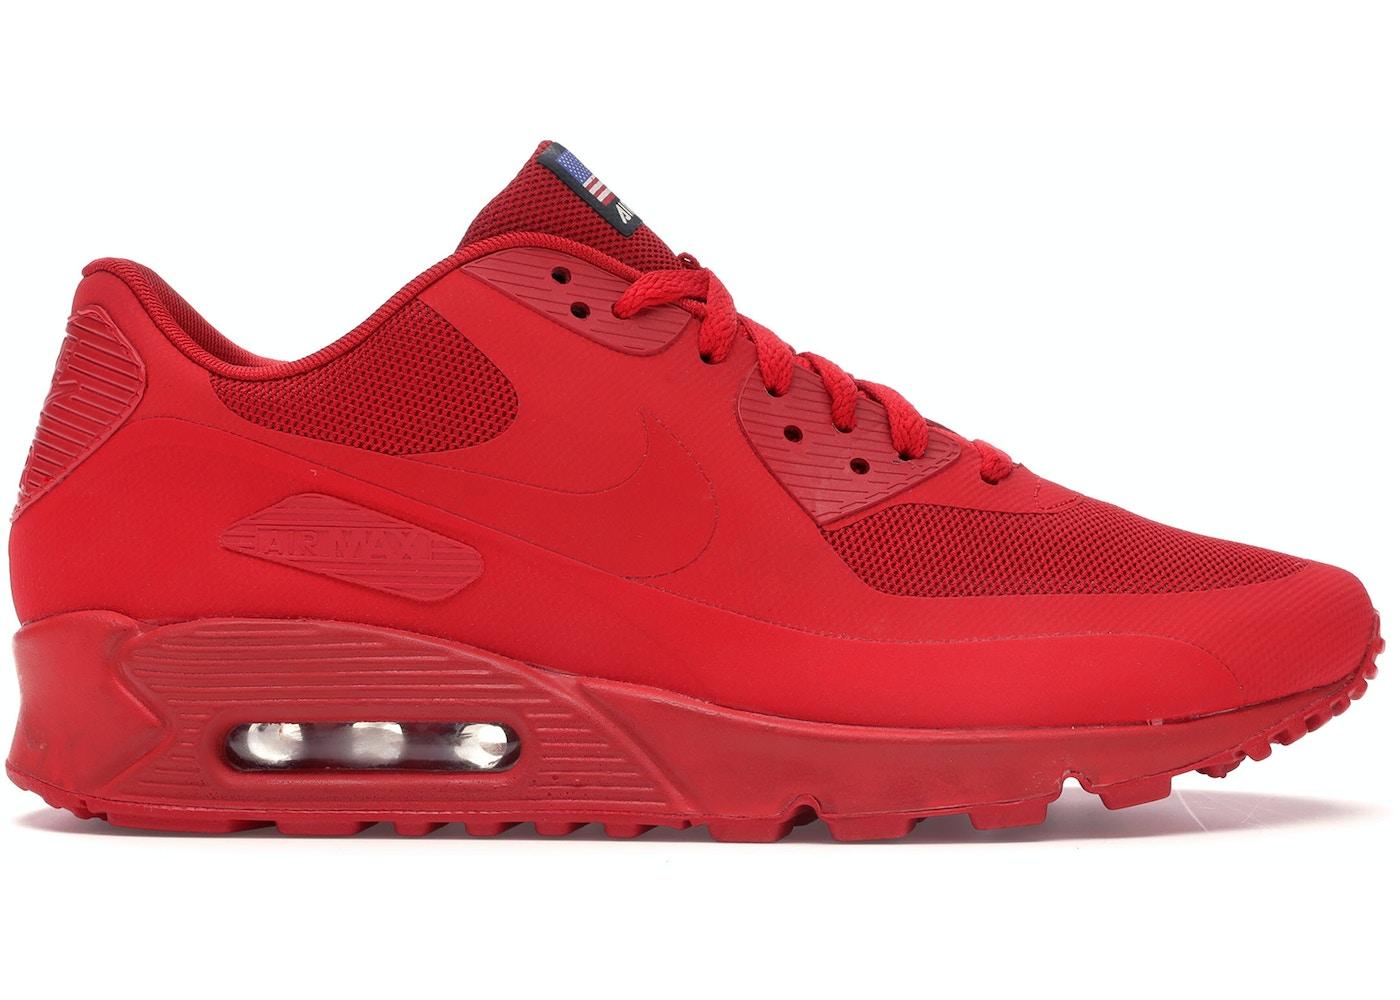 Temporada Recordar Gastos de envío  Nike Air Max 90 Hyperfuse Independence Day Red - 613841-660